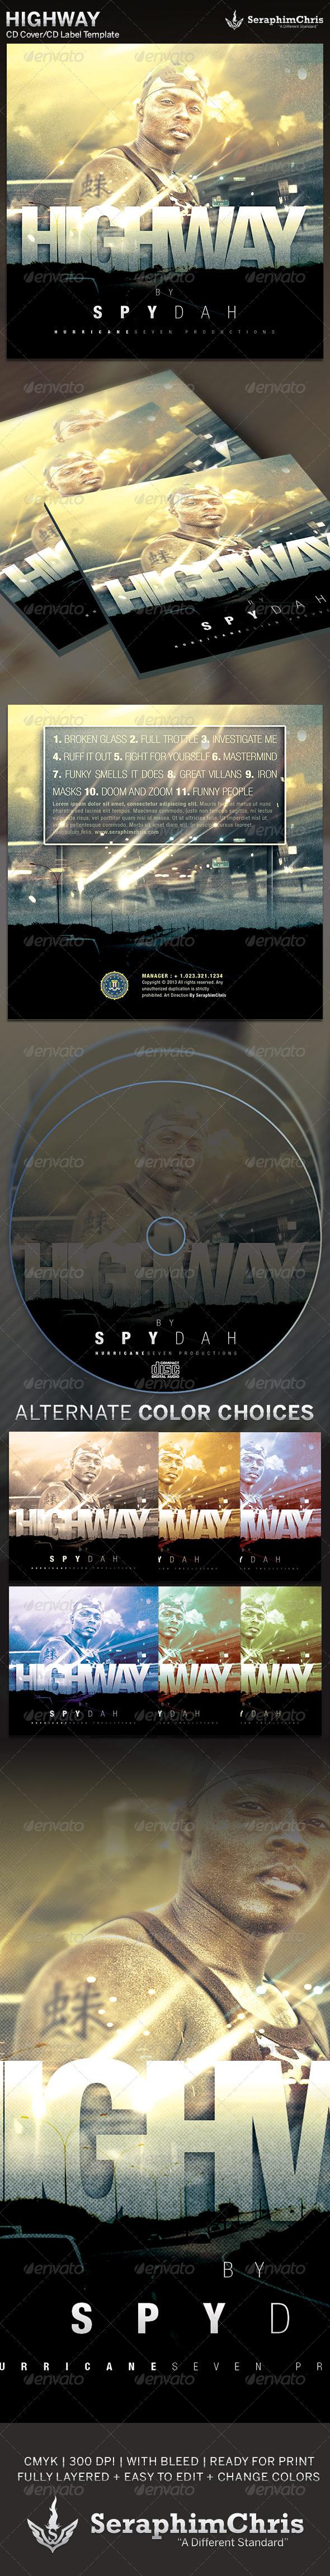 Highway: CD Cover Artwork Template - CD & DVD Artwork Print Templates